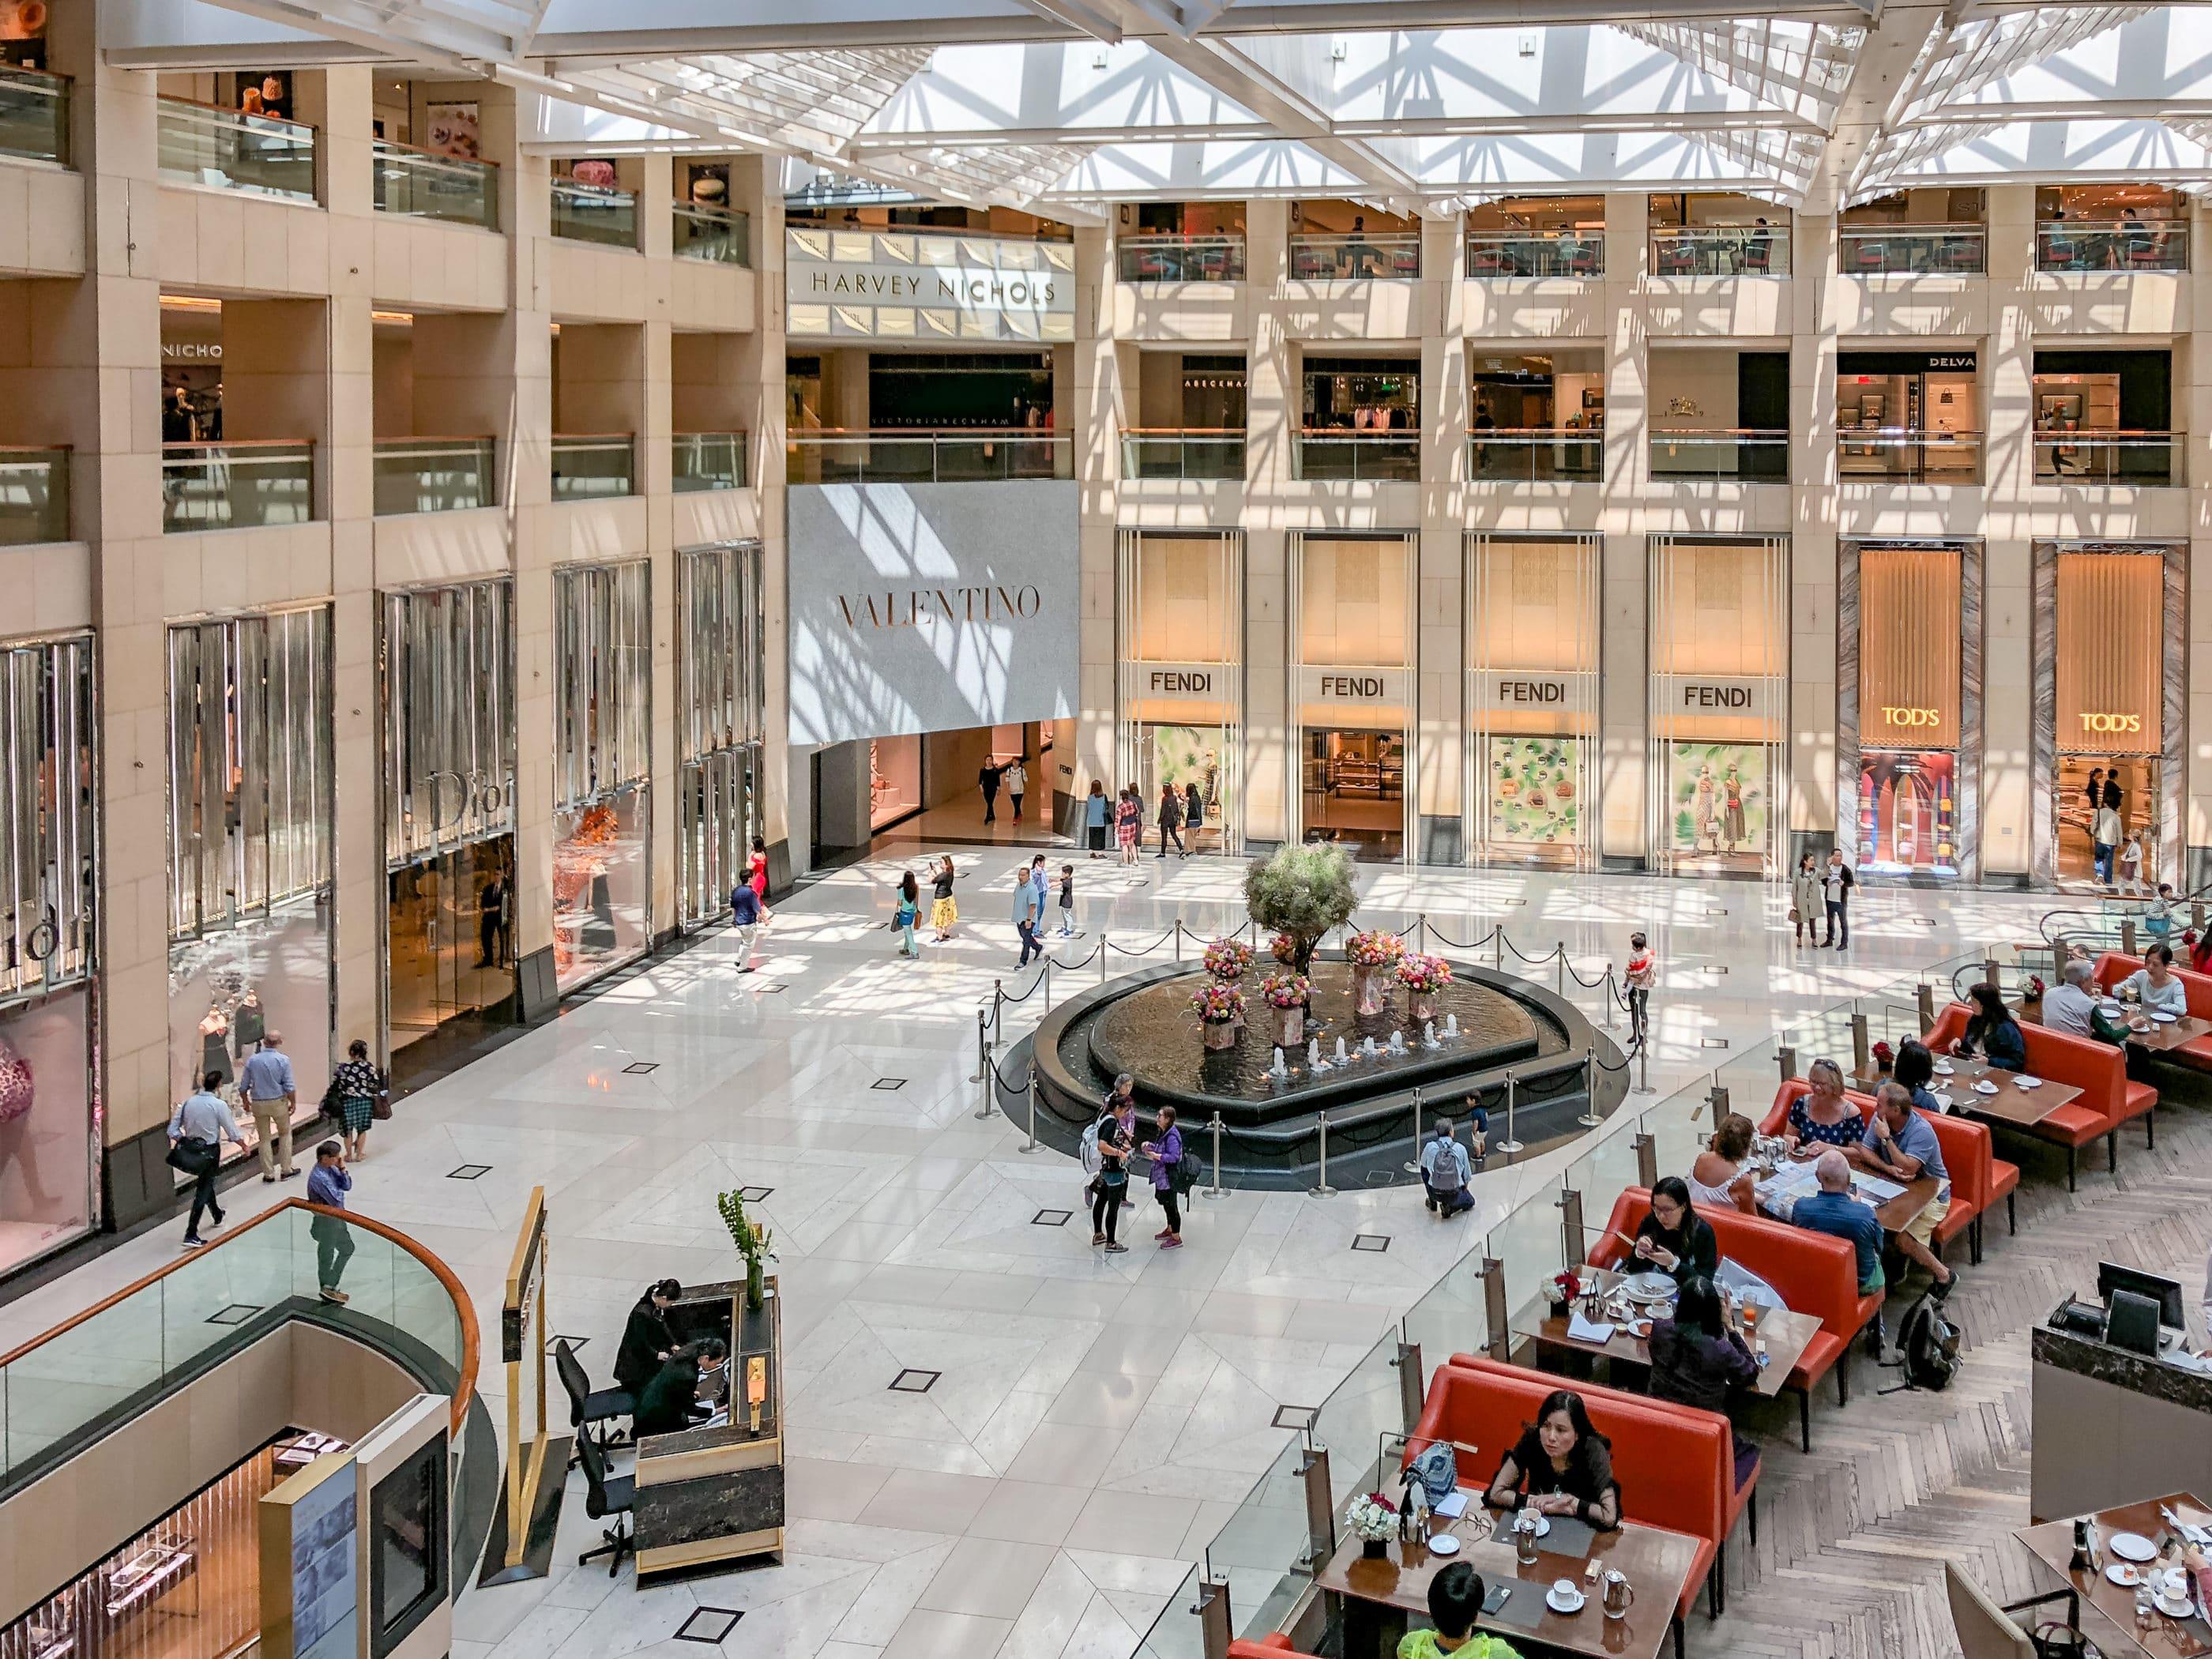 Hong Kong Shopping: The Landmark Atrium mall